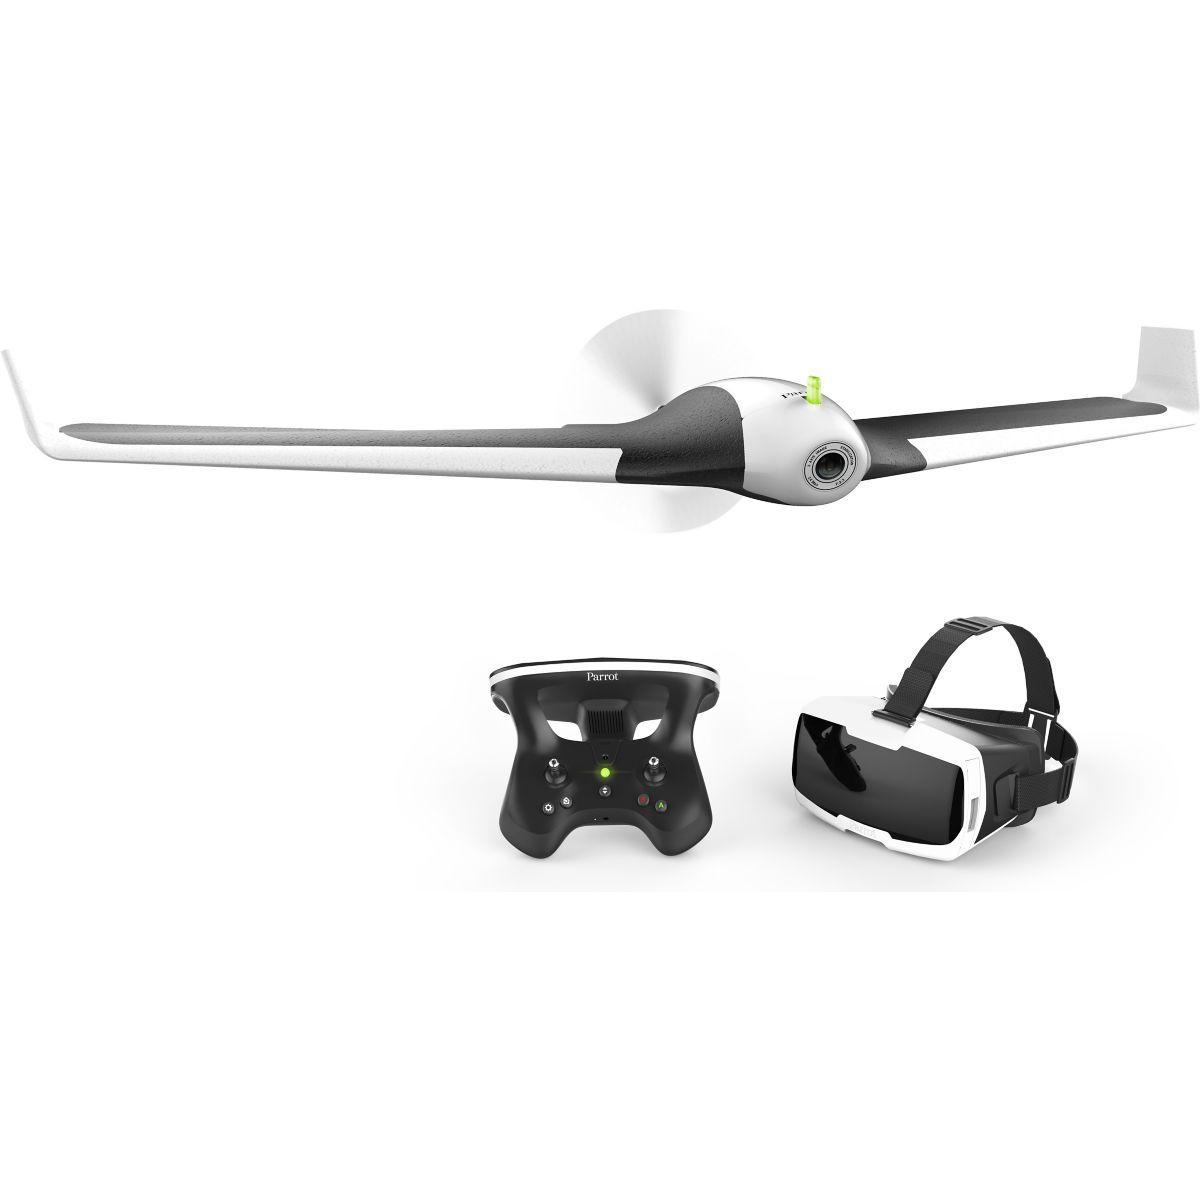 Drone parrot disco + pack fpv - livraison offerte : code livpremium (photo)